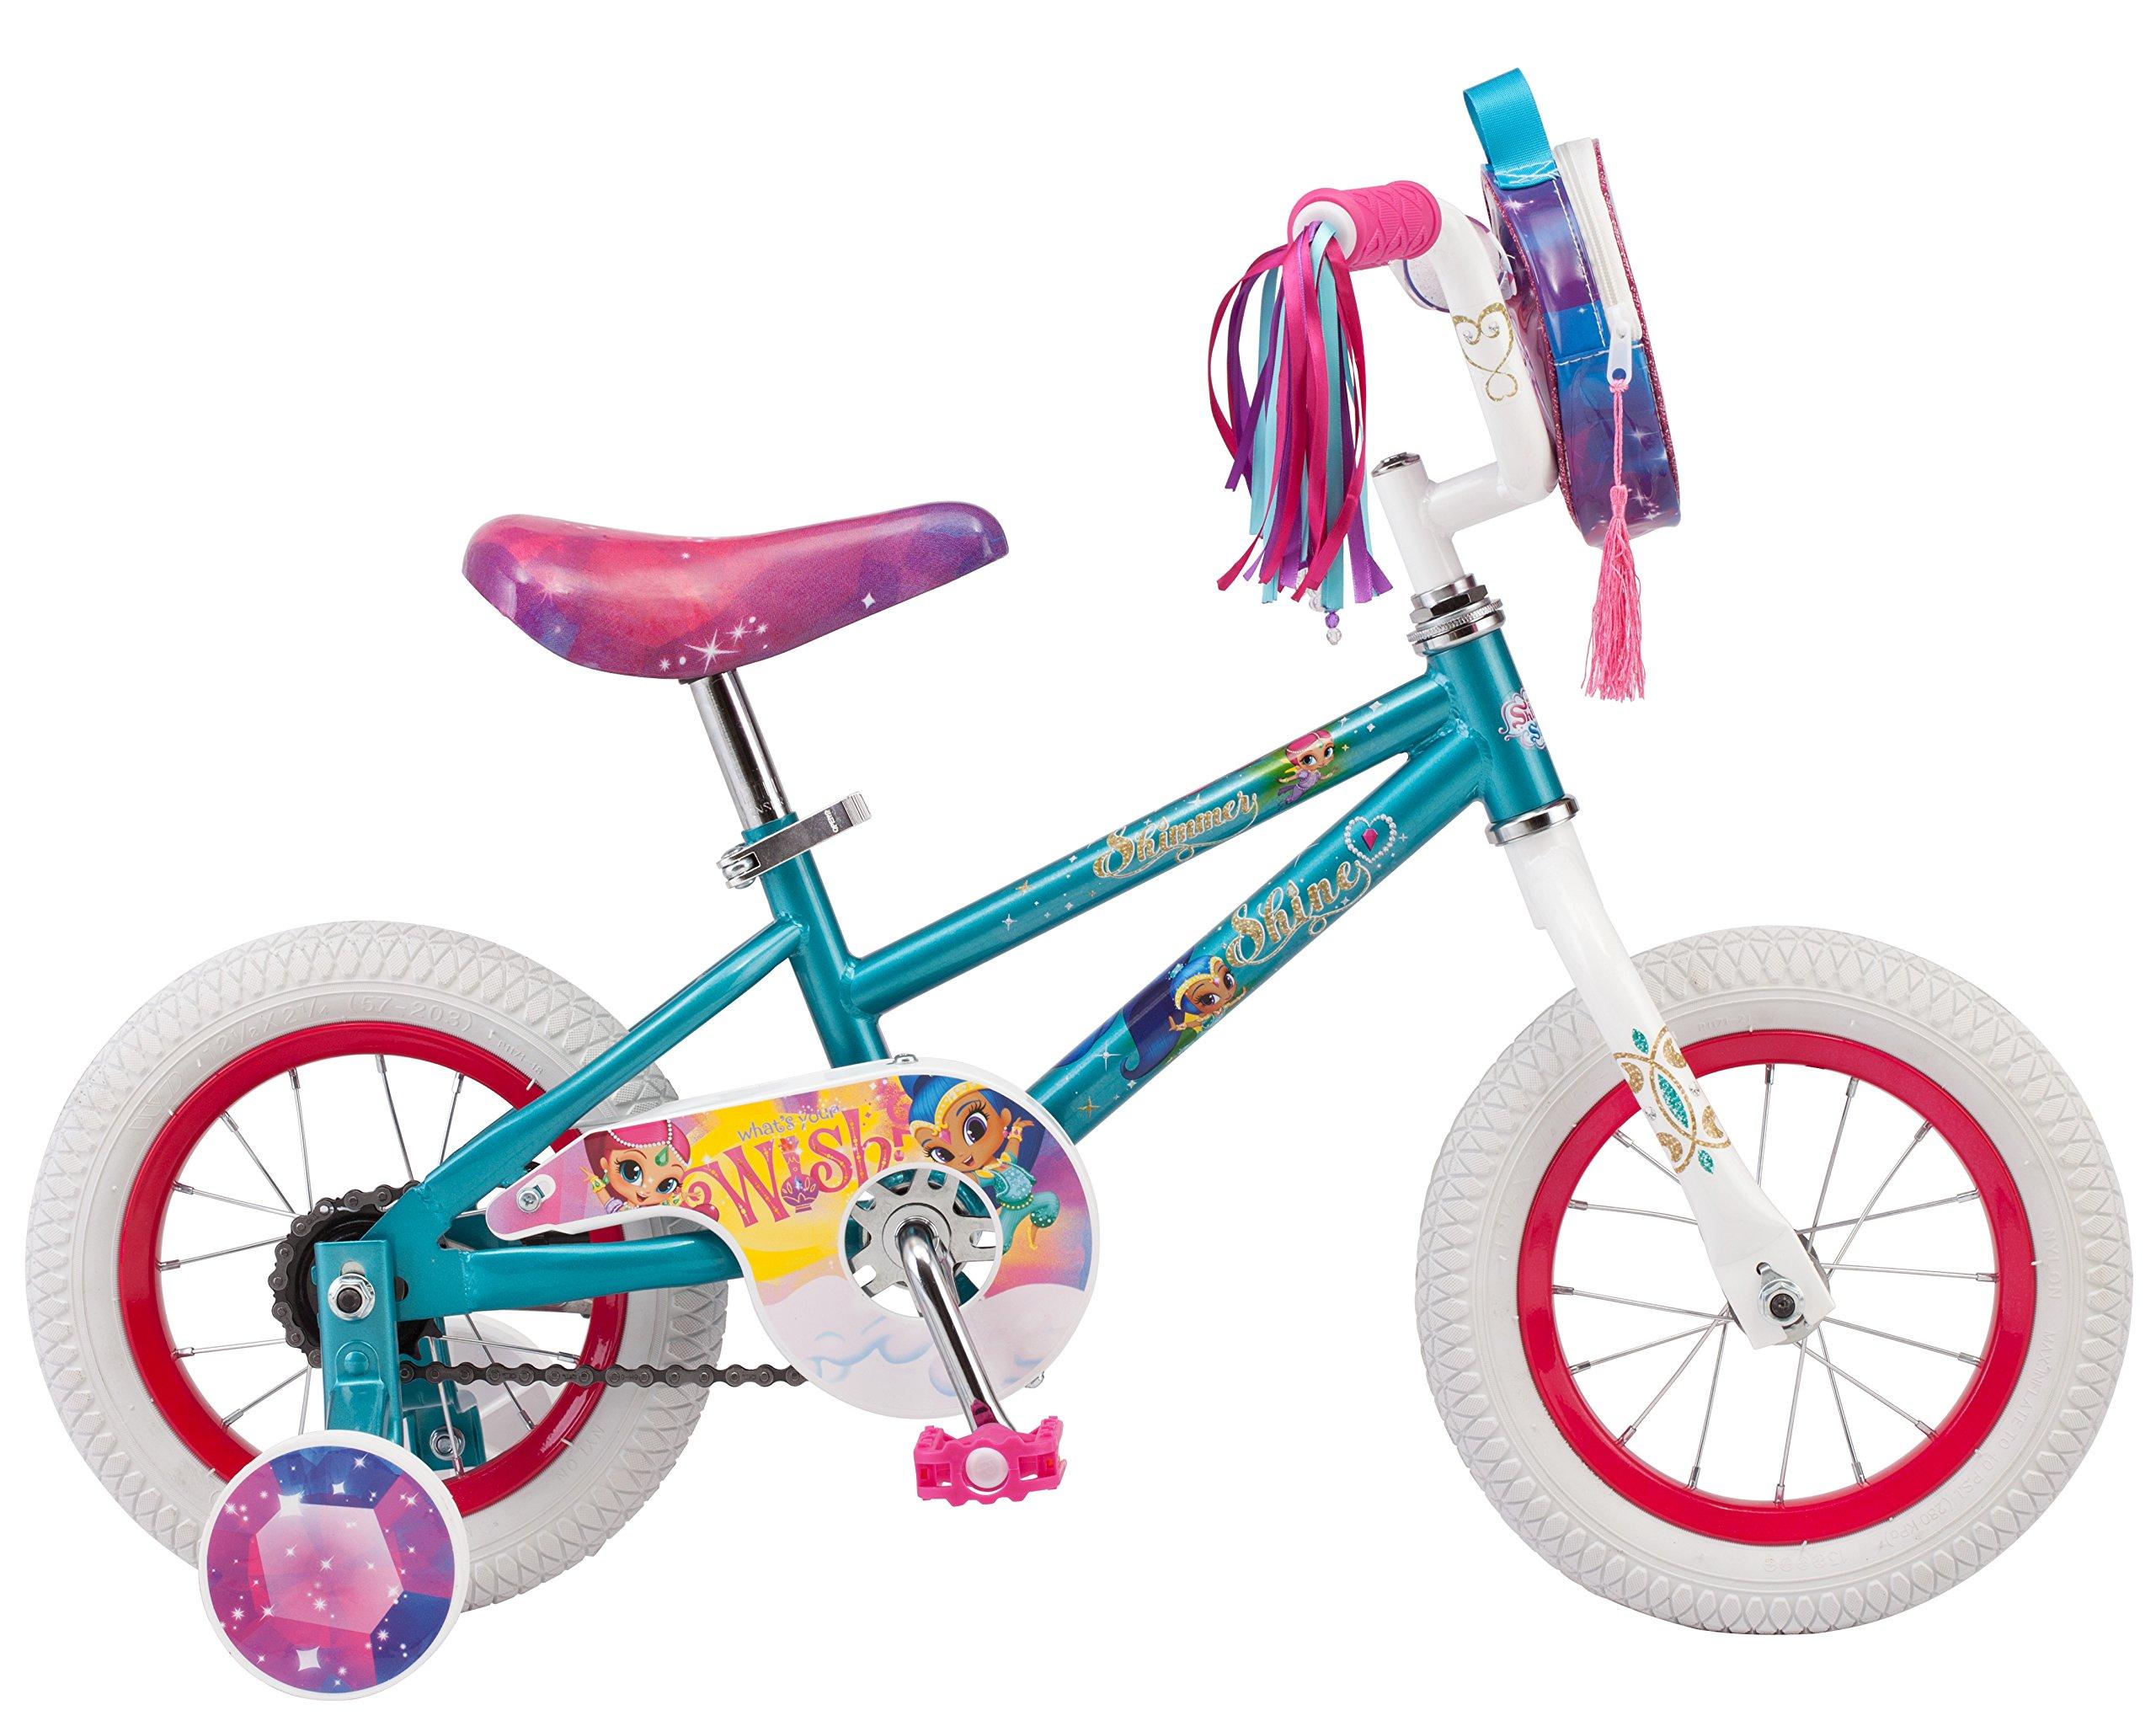 Shimmer & Shine Girl's Bicycle, 12'' Wheel, Teal